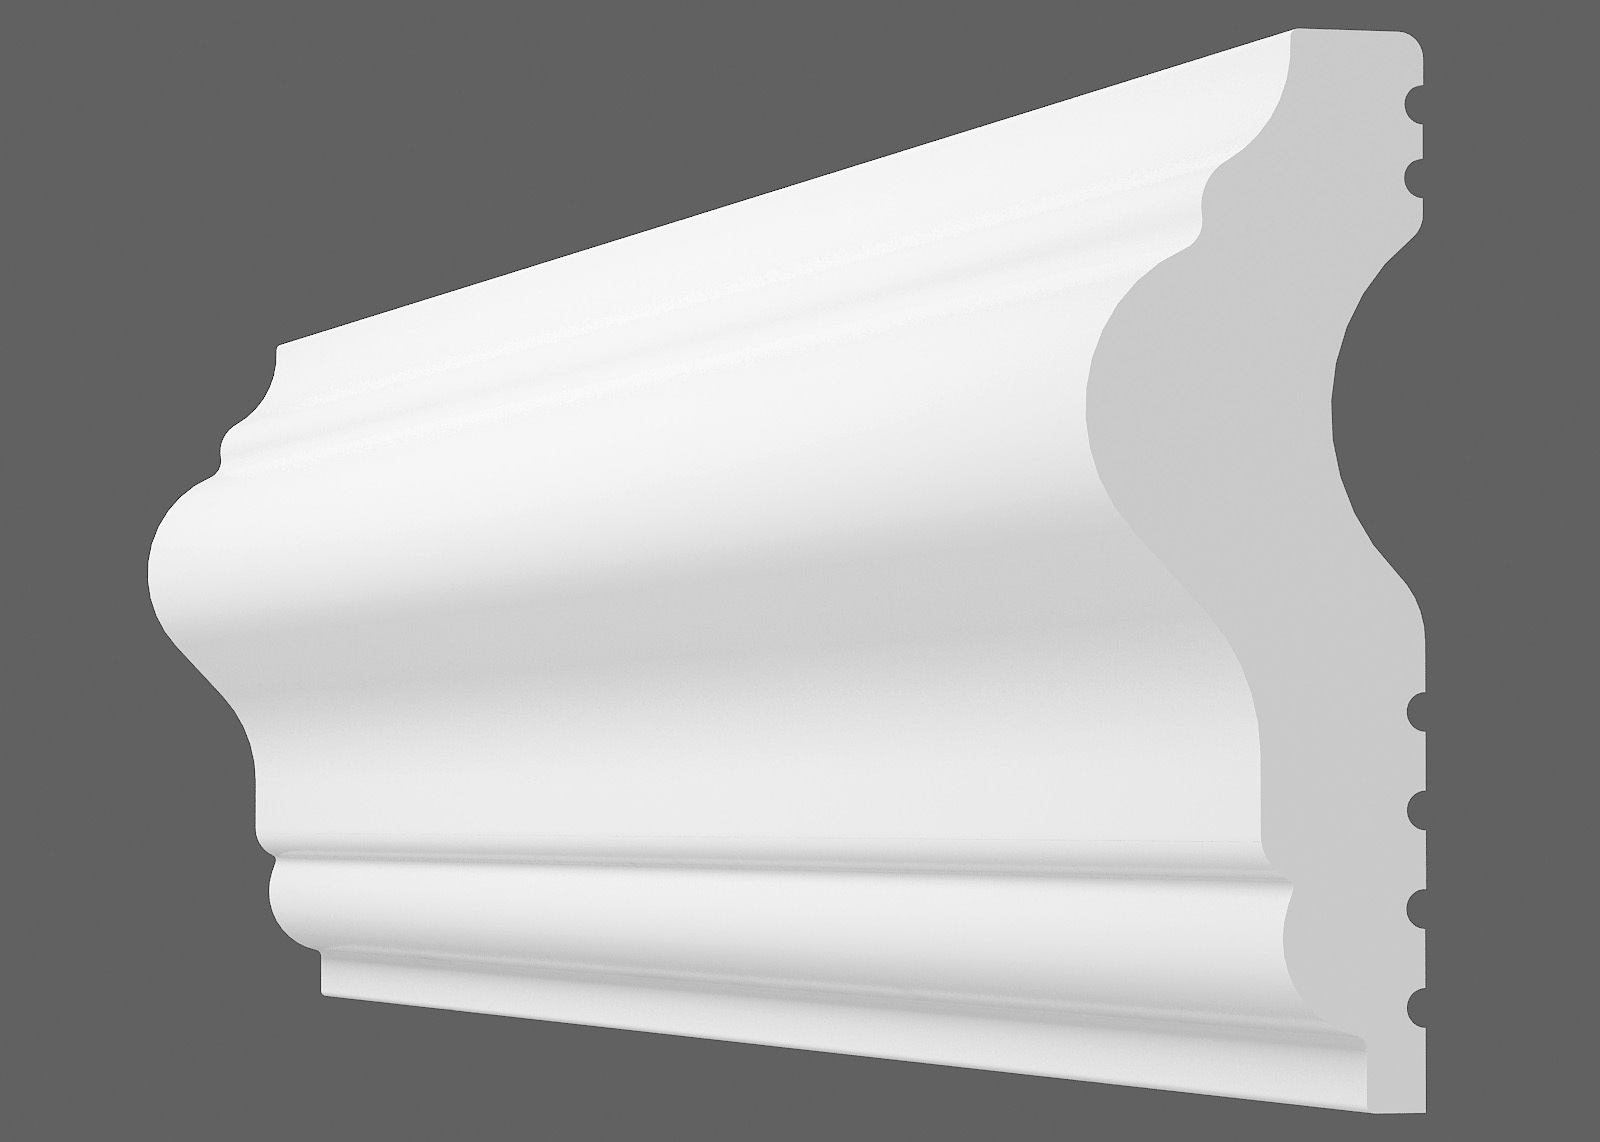 Потолочный плинтус U-40 (Размер:15х40мм)